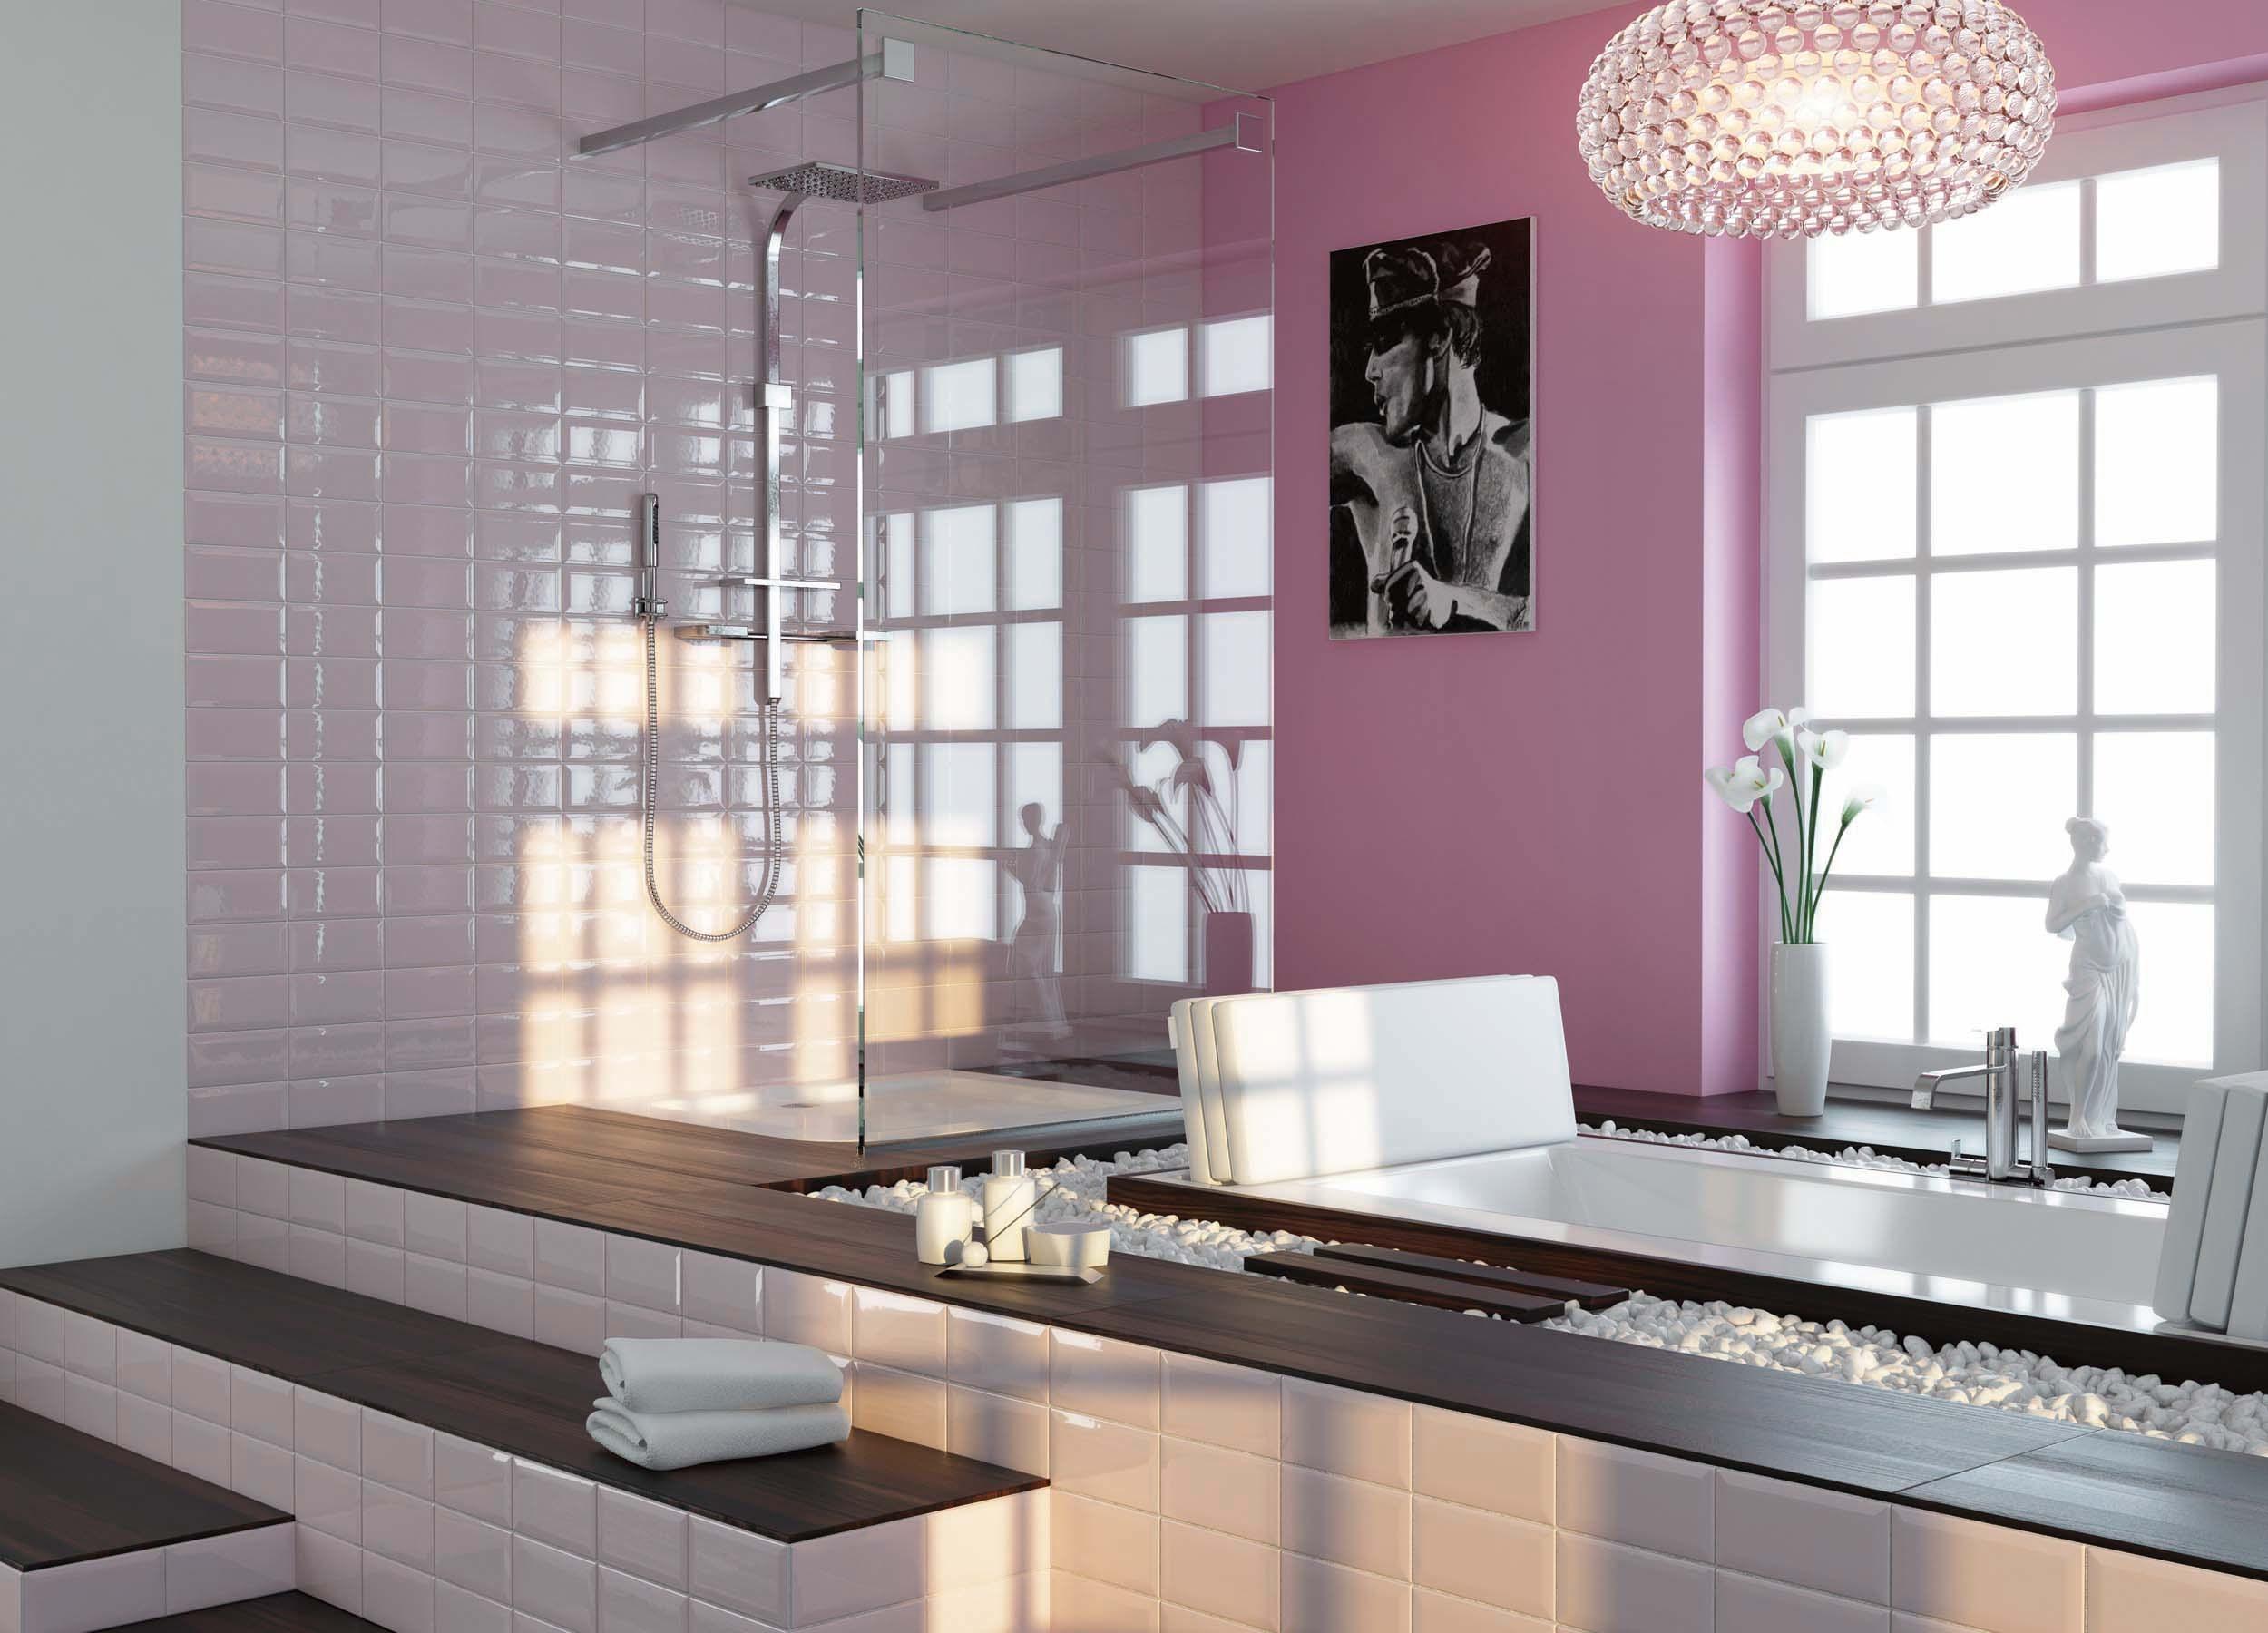 Ceramiche vogue rivenditore a taranto arredo bagno for Vogue ceramica